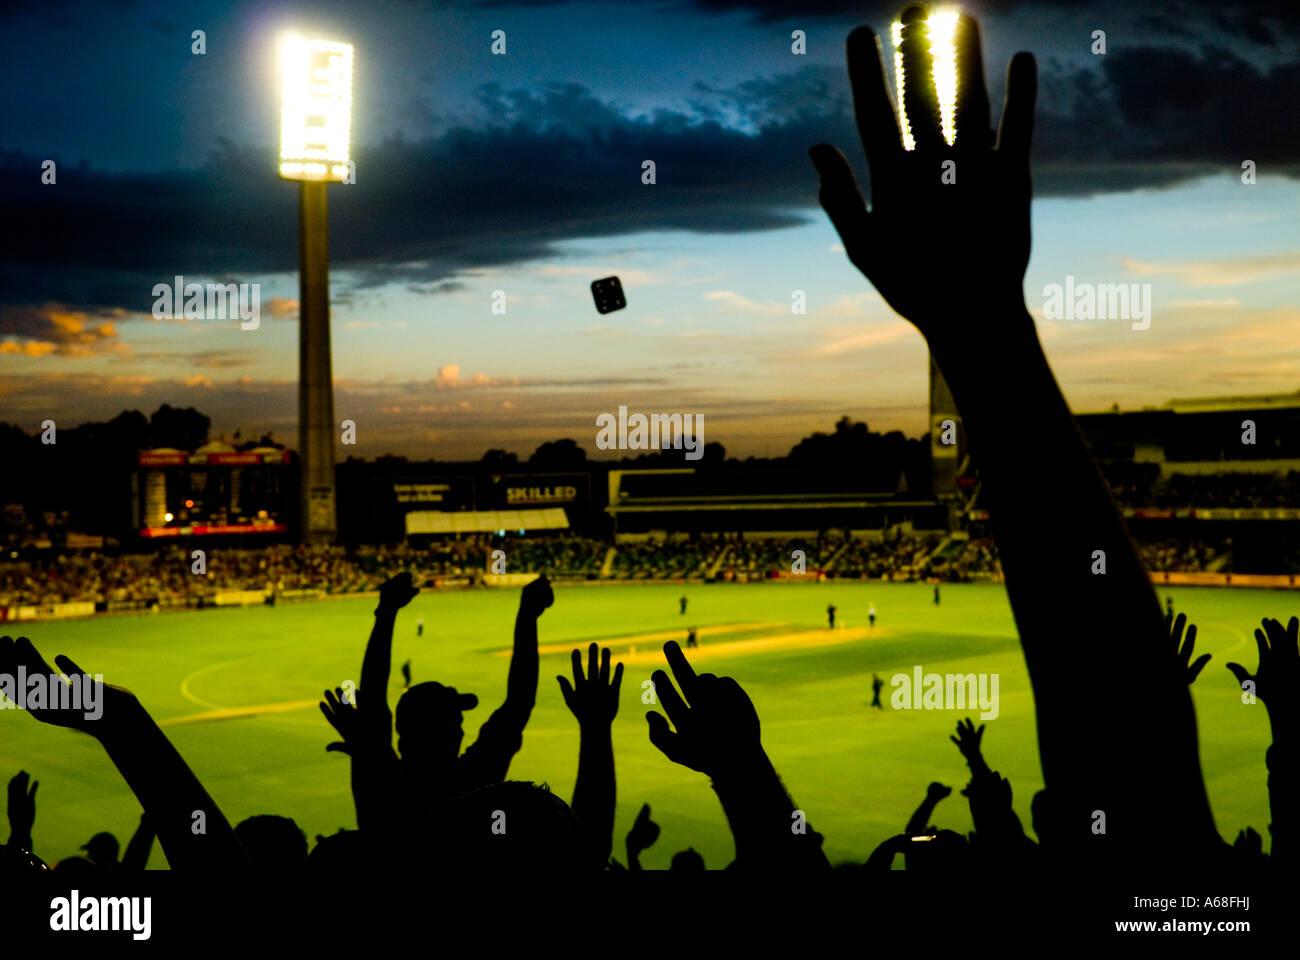 Fans tut Laola-Welle bei Nacht Cricket match, Perth, Western Australia Stockbild